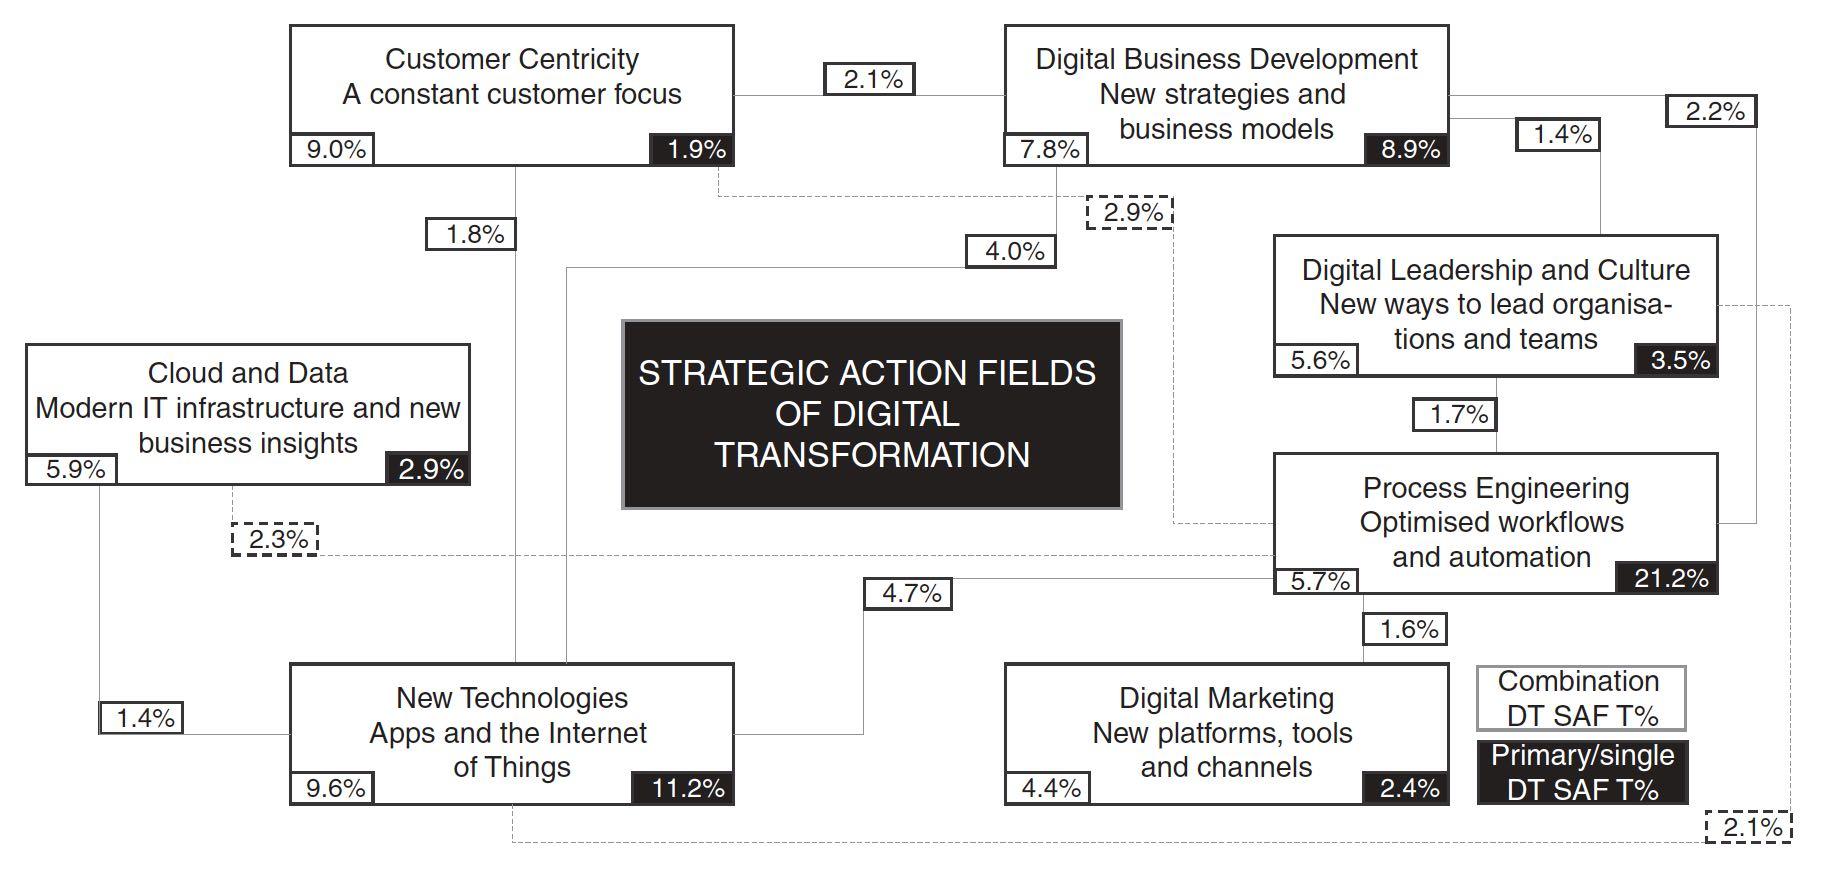 Strategic Action Fields of Digital Transformation